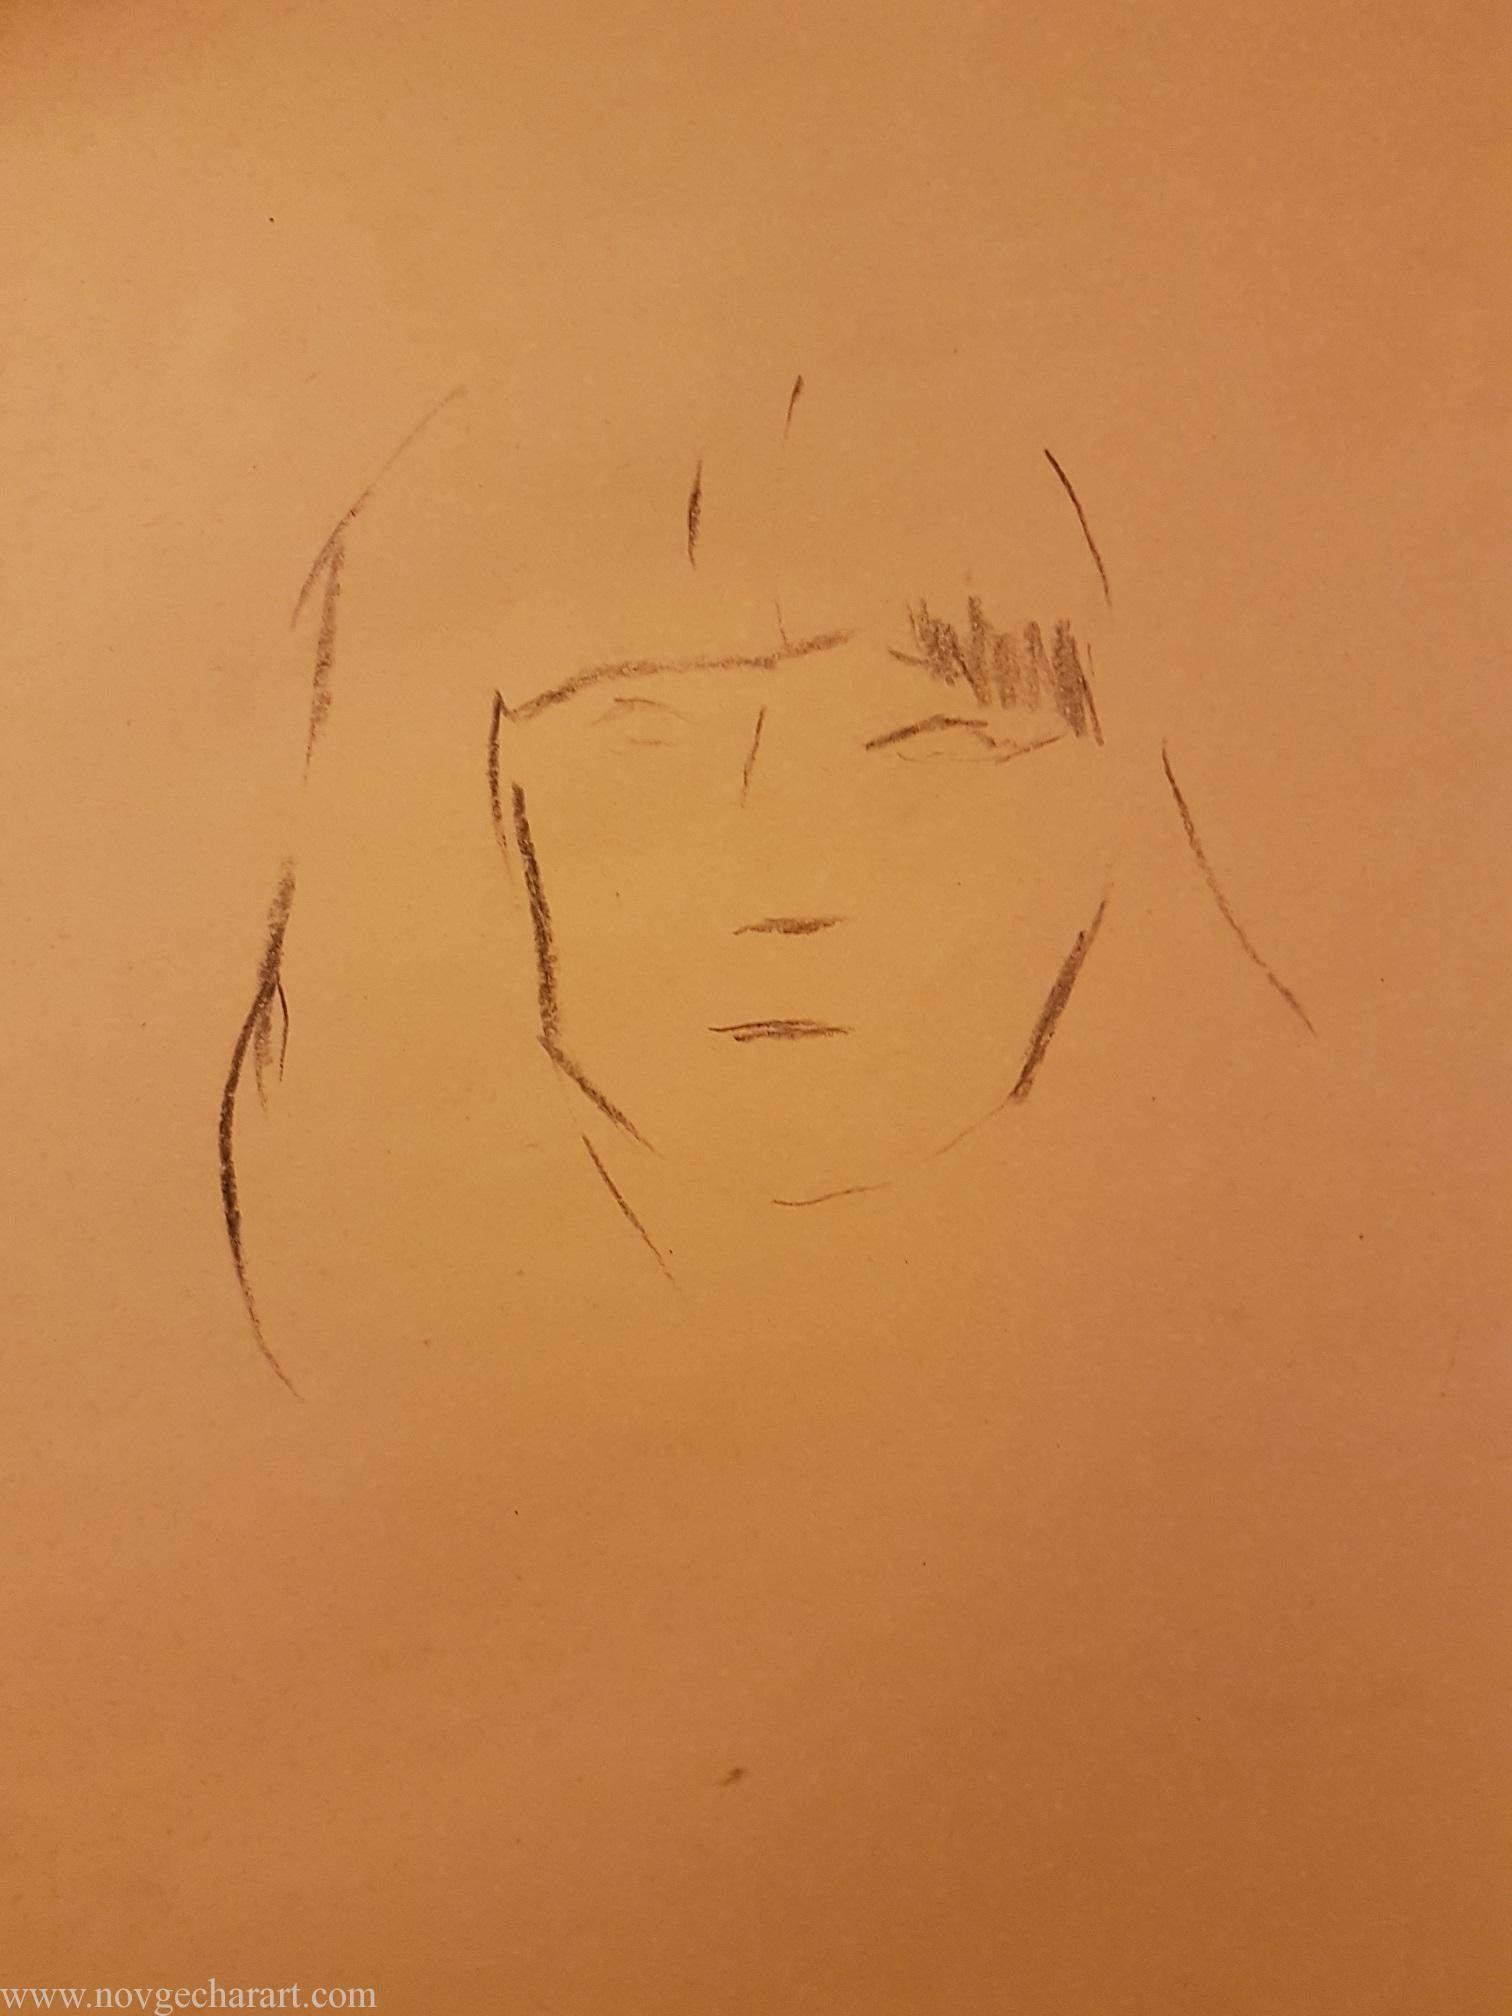 Draw Portrait of Girl